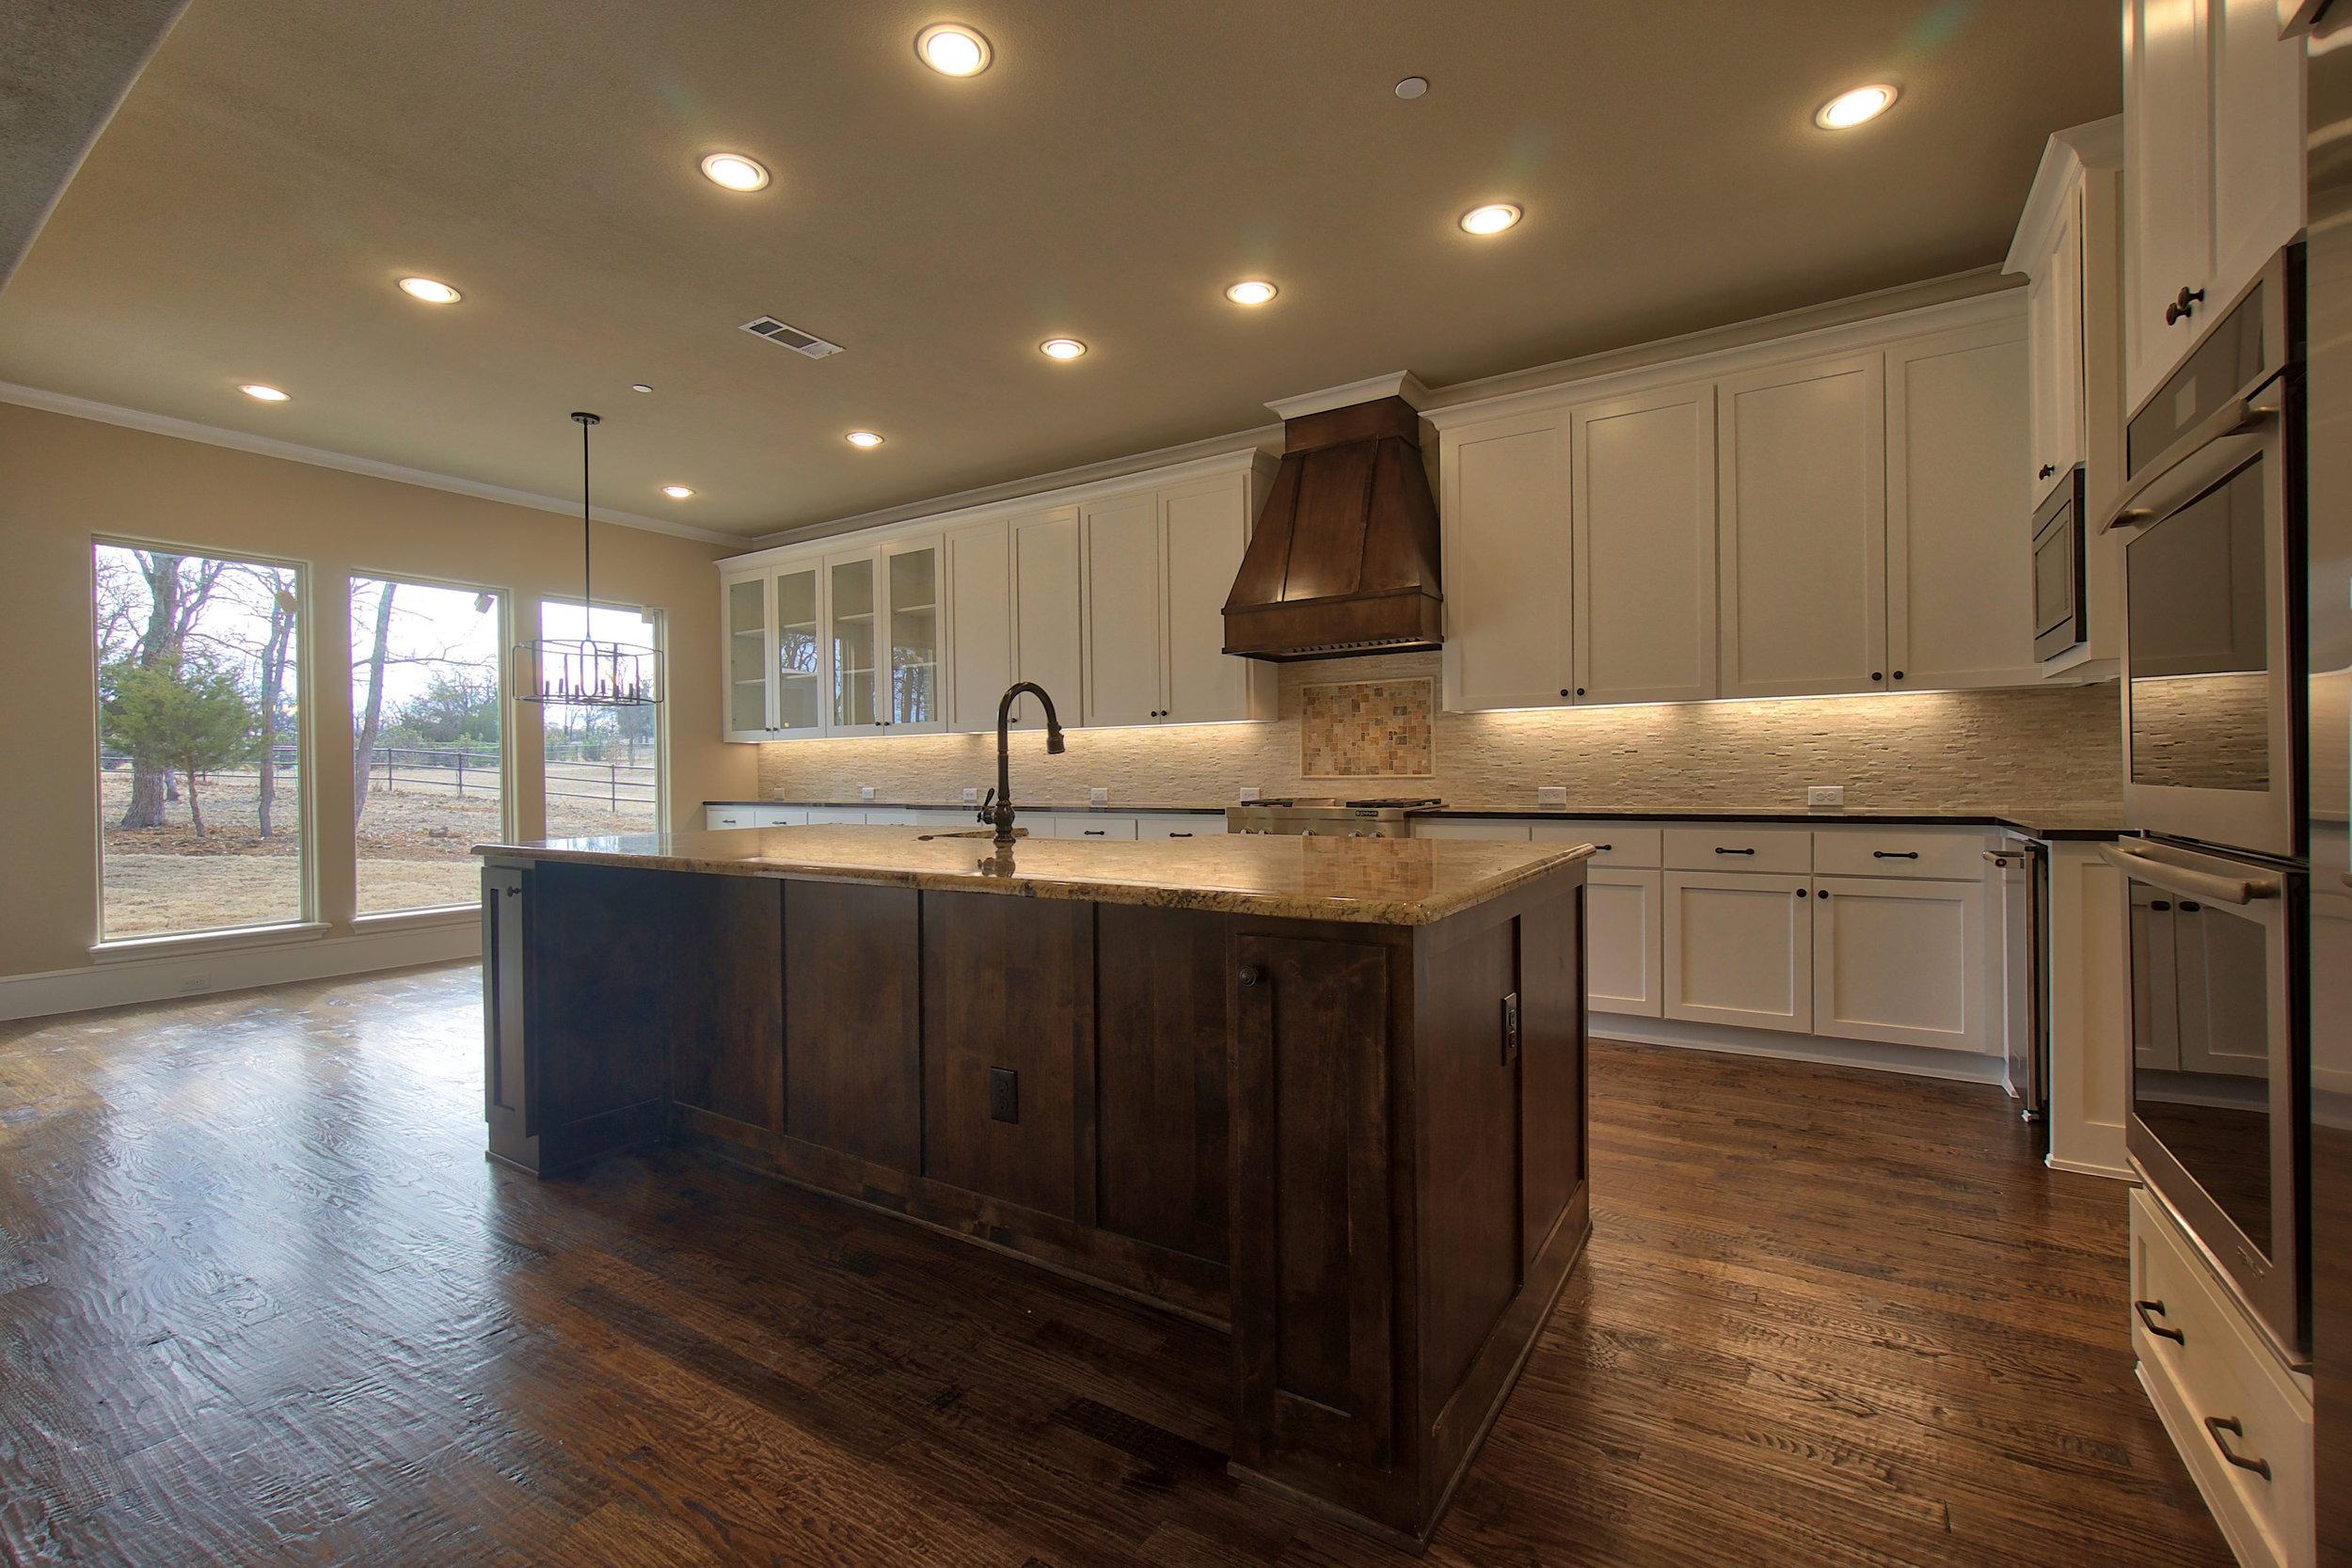 14 kitchen 2.jpeg